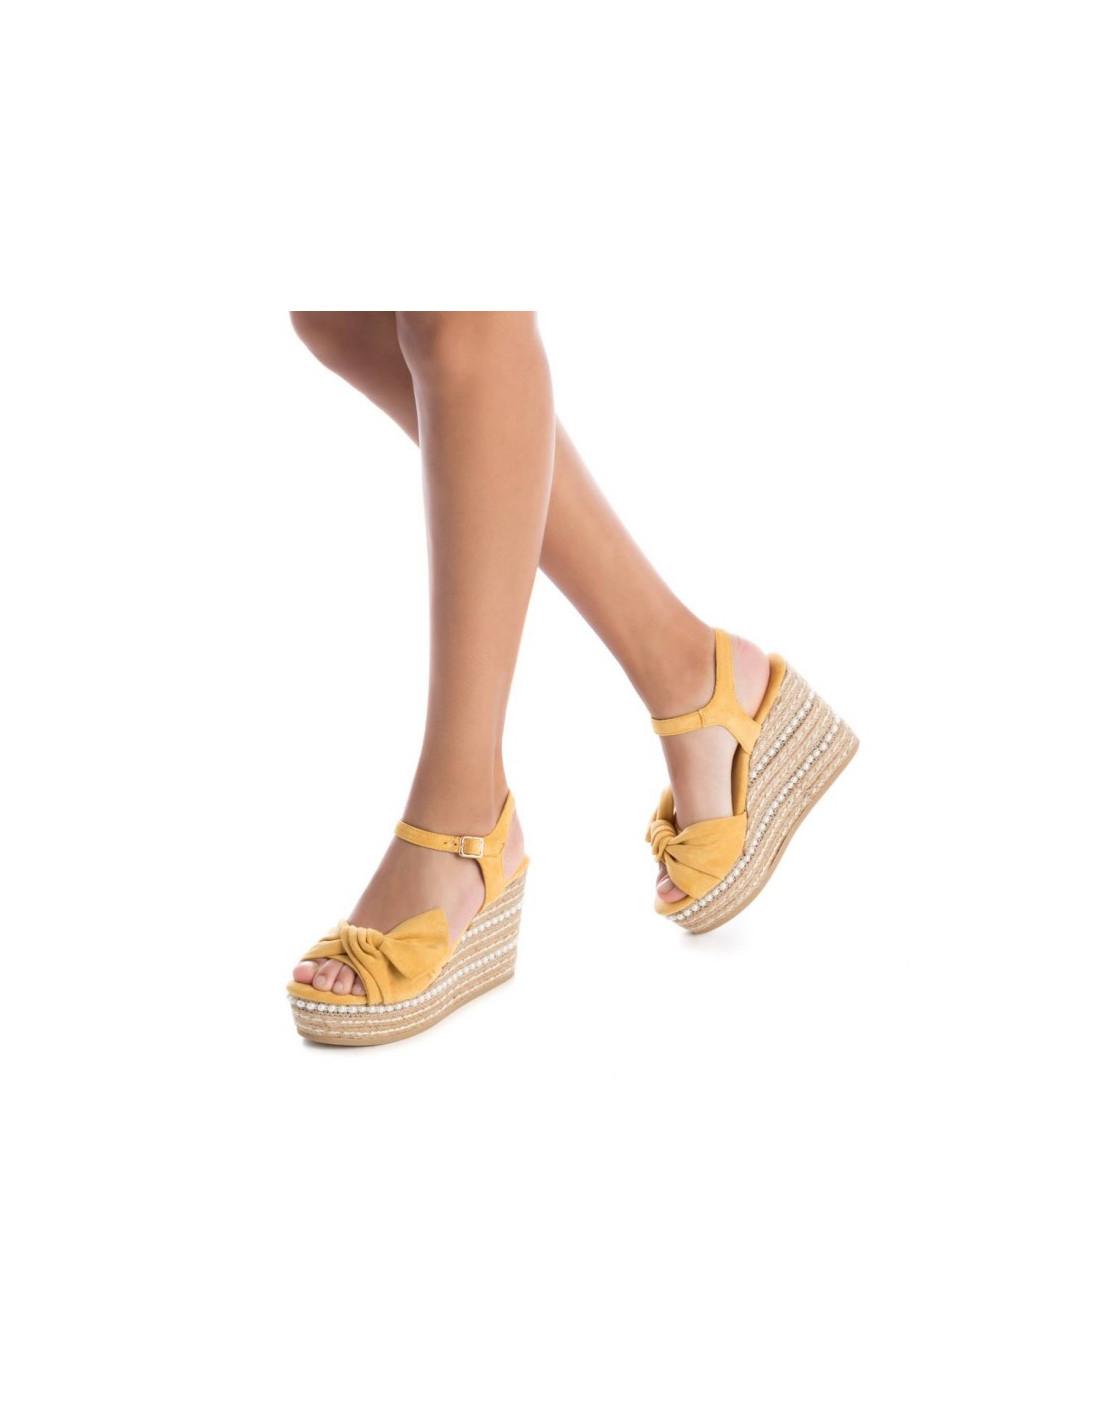 Xti Yute Cuña De Marca Amarillo Verano Primavera Mujer La Color Pk08nwO